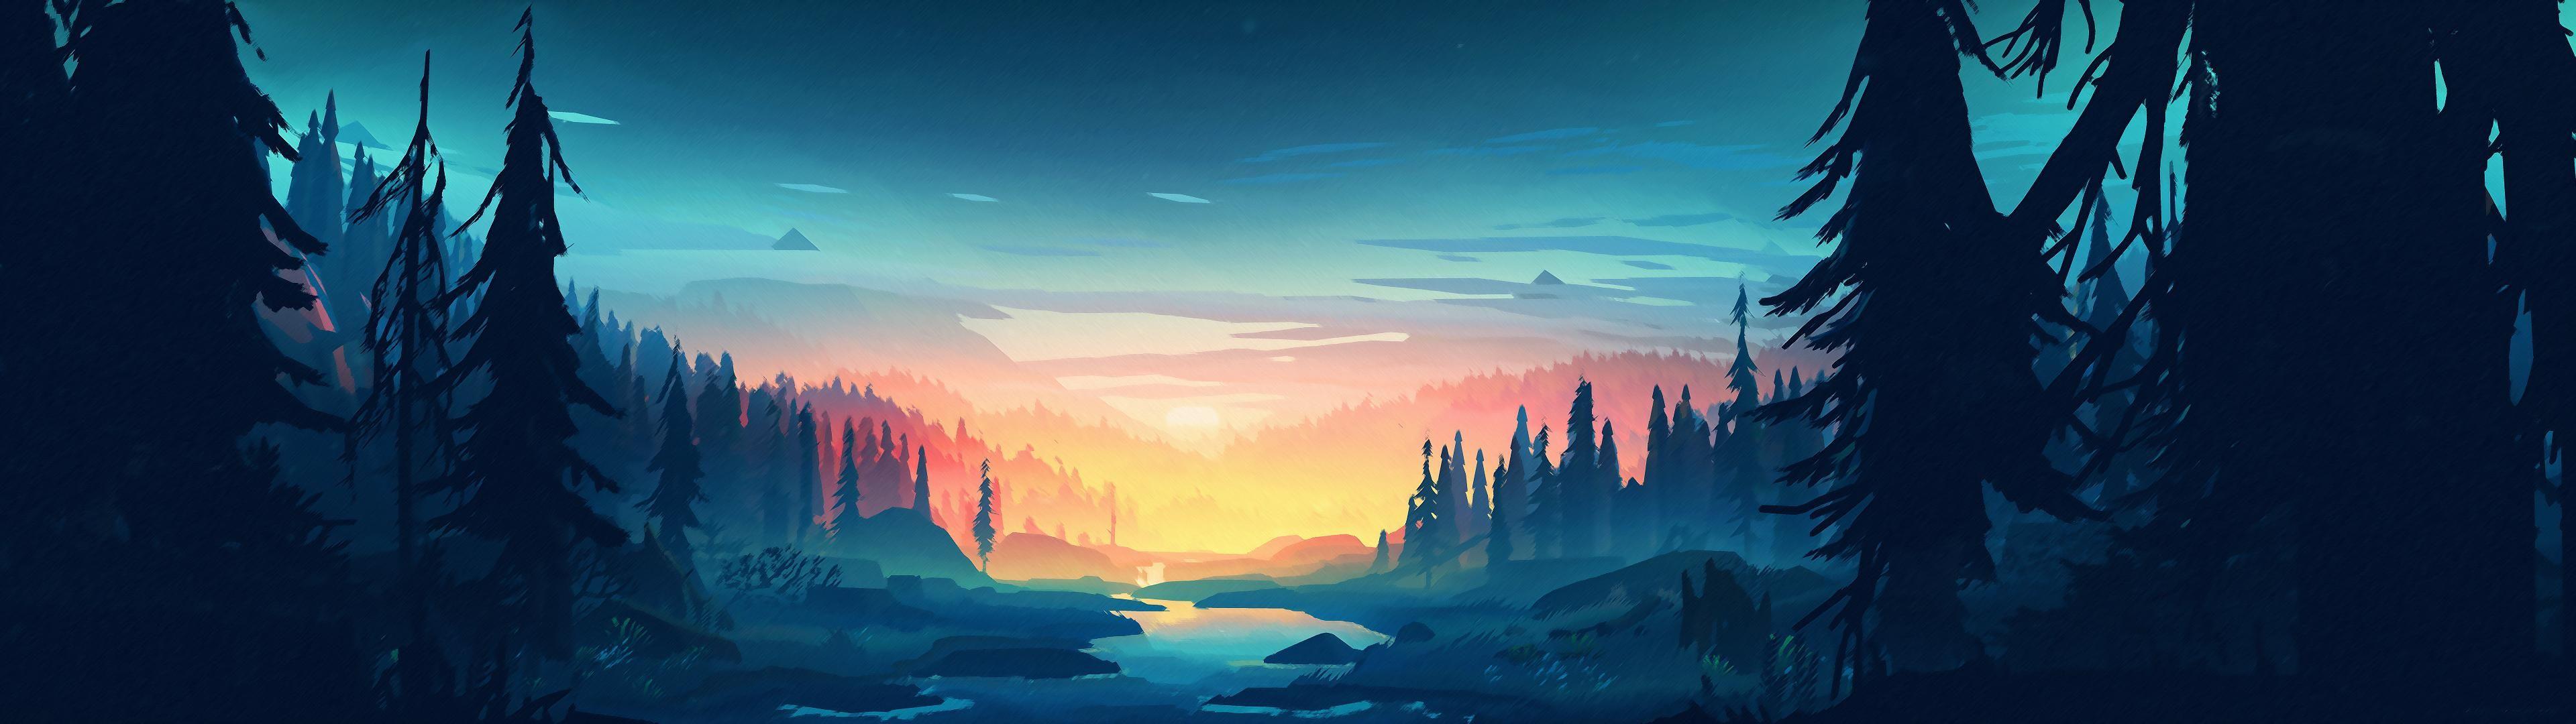 Wide Minimalistic Landscape wallpaper Landscape